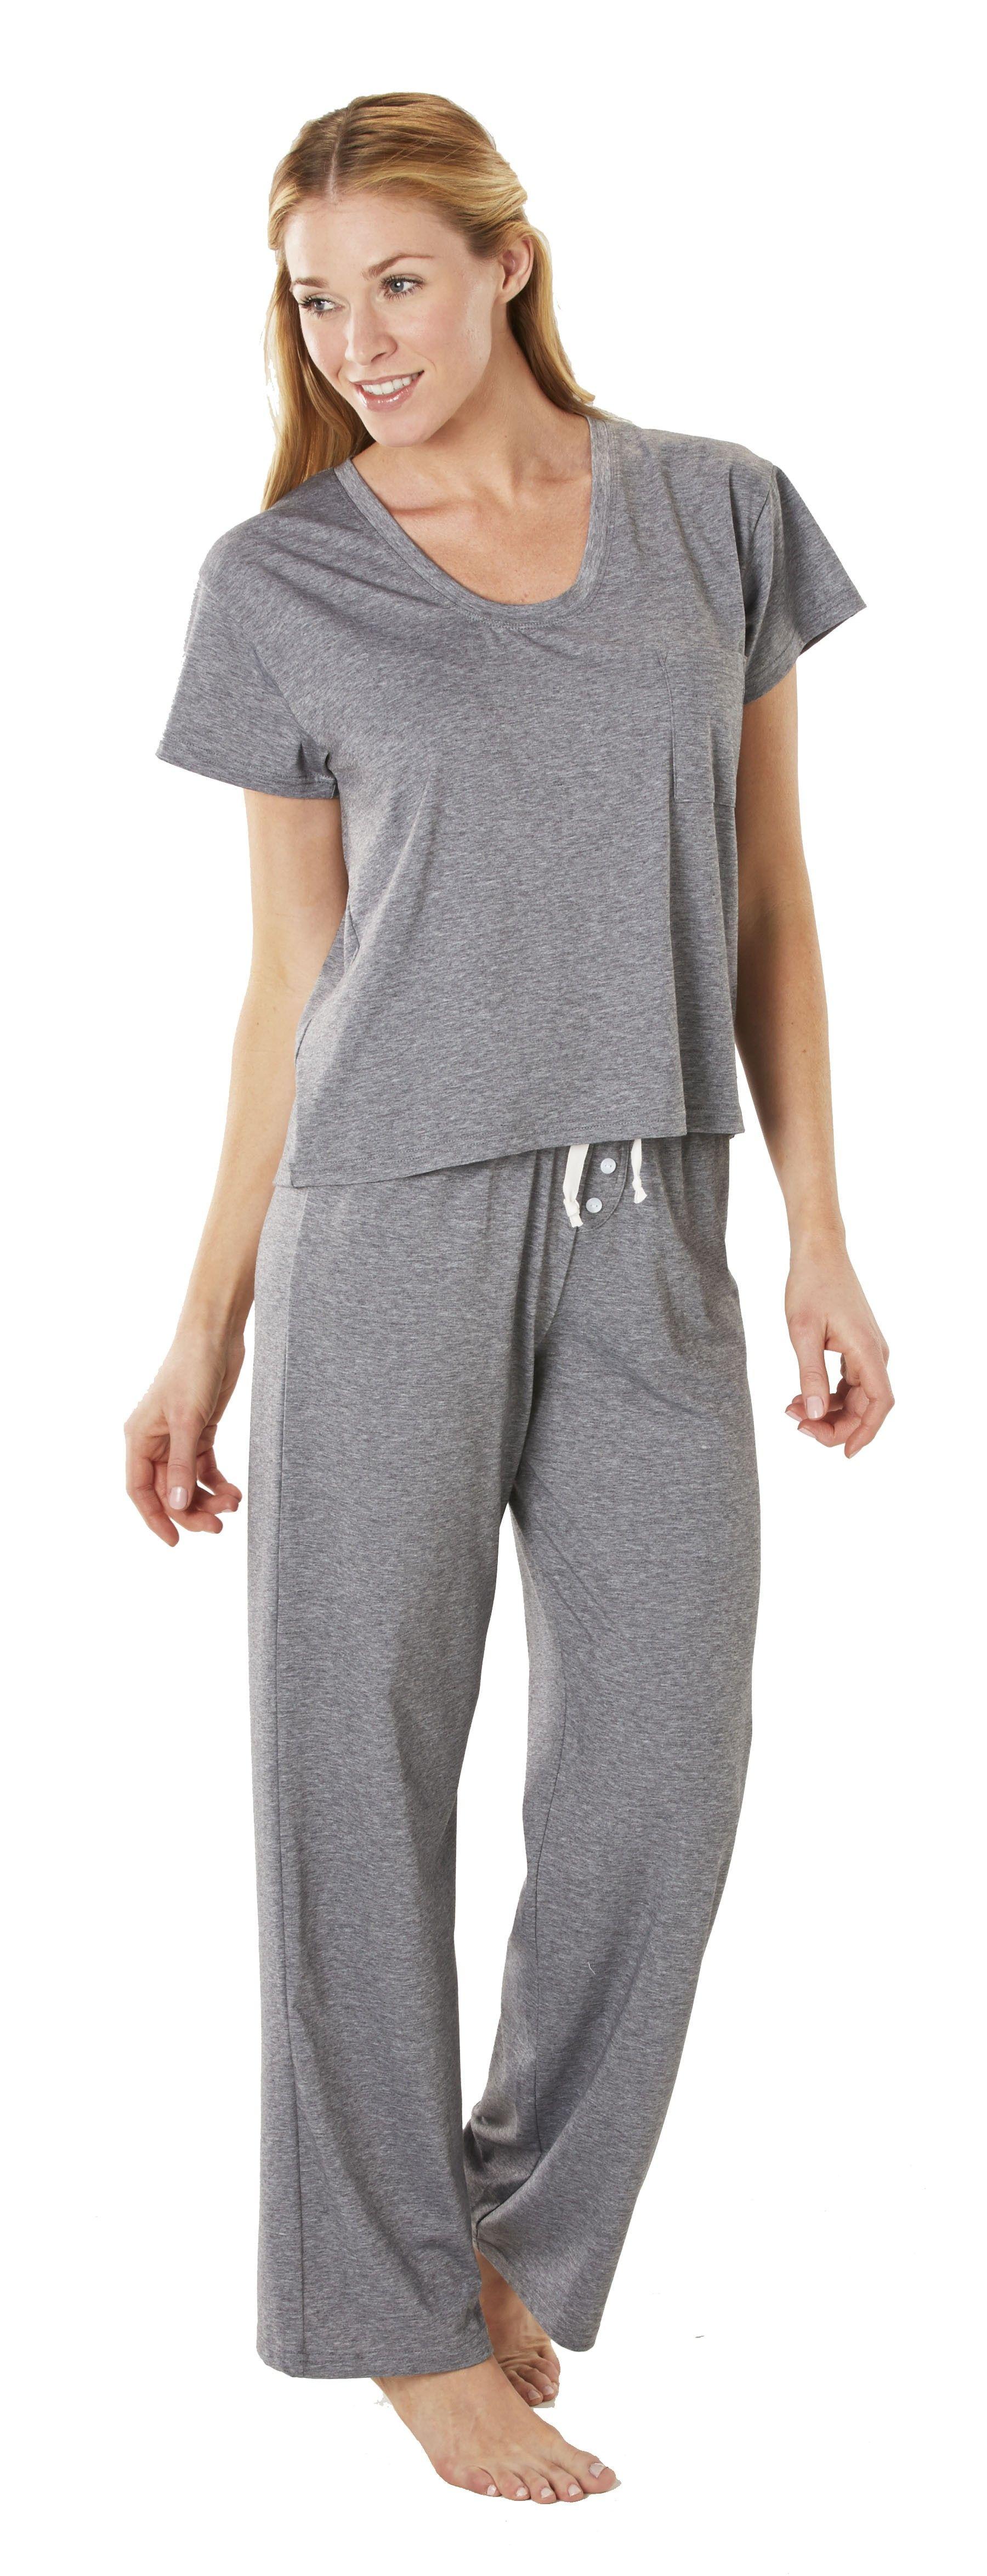 Softies Moisture Wicking Boyfriend Ankle Pj Pajama Set Summer